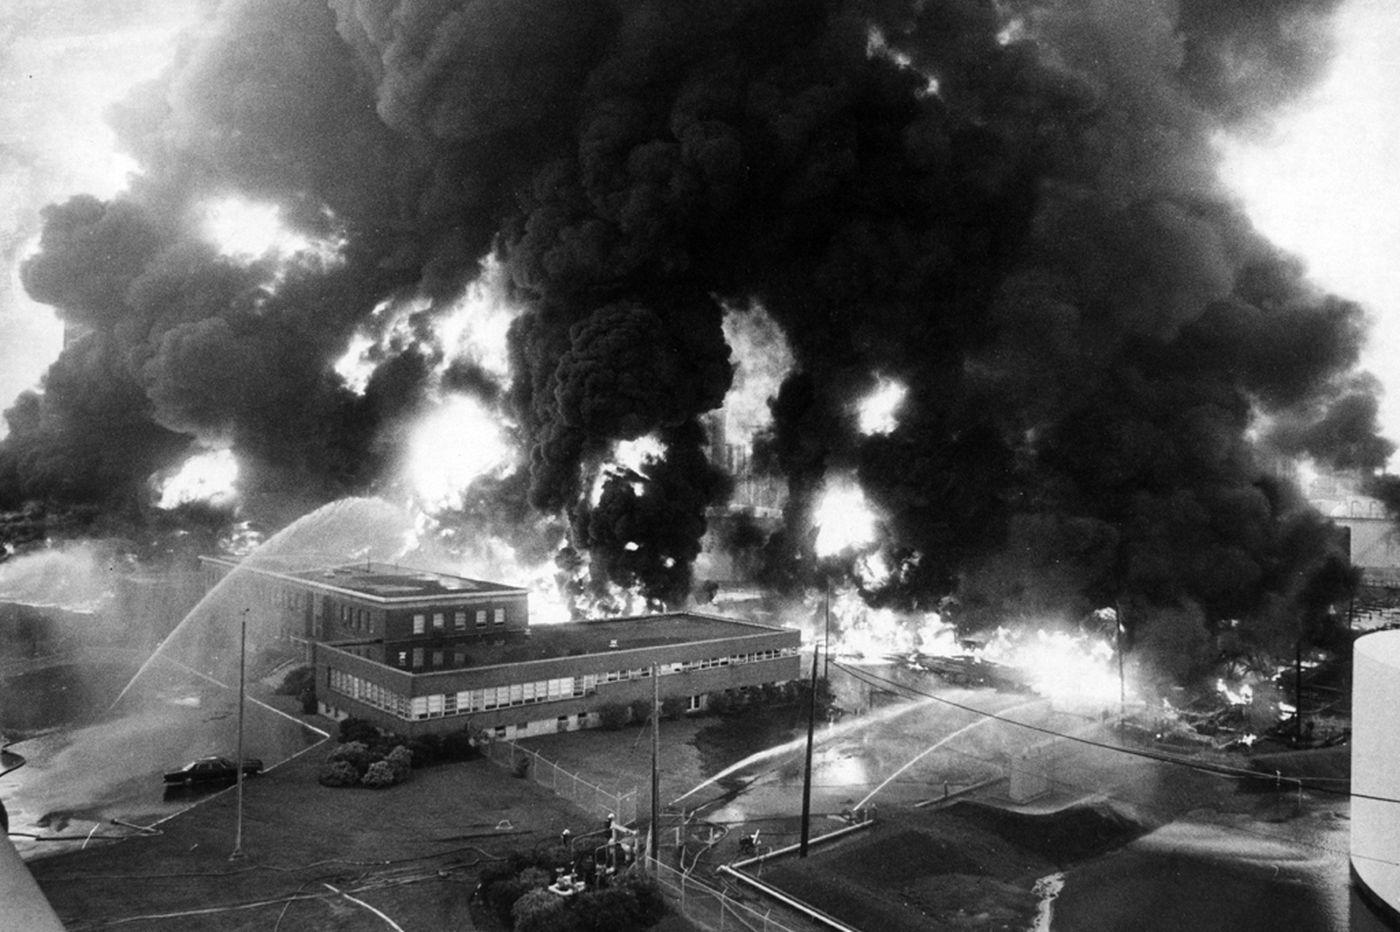 Ceremony marks 1975 Gulf oil refinery blaze that killed eight firefighters